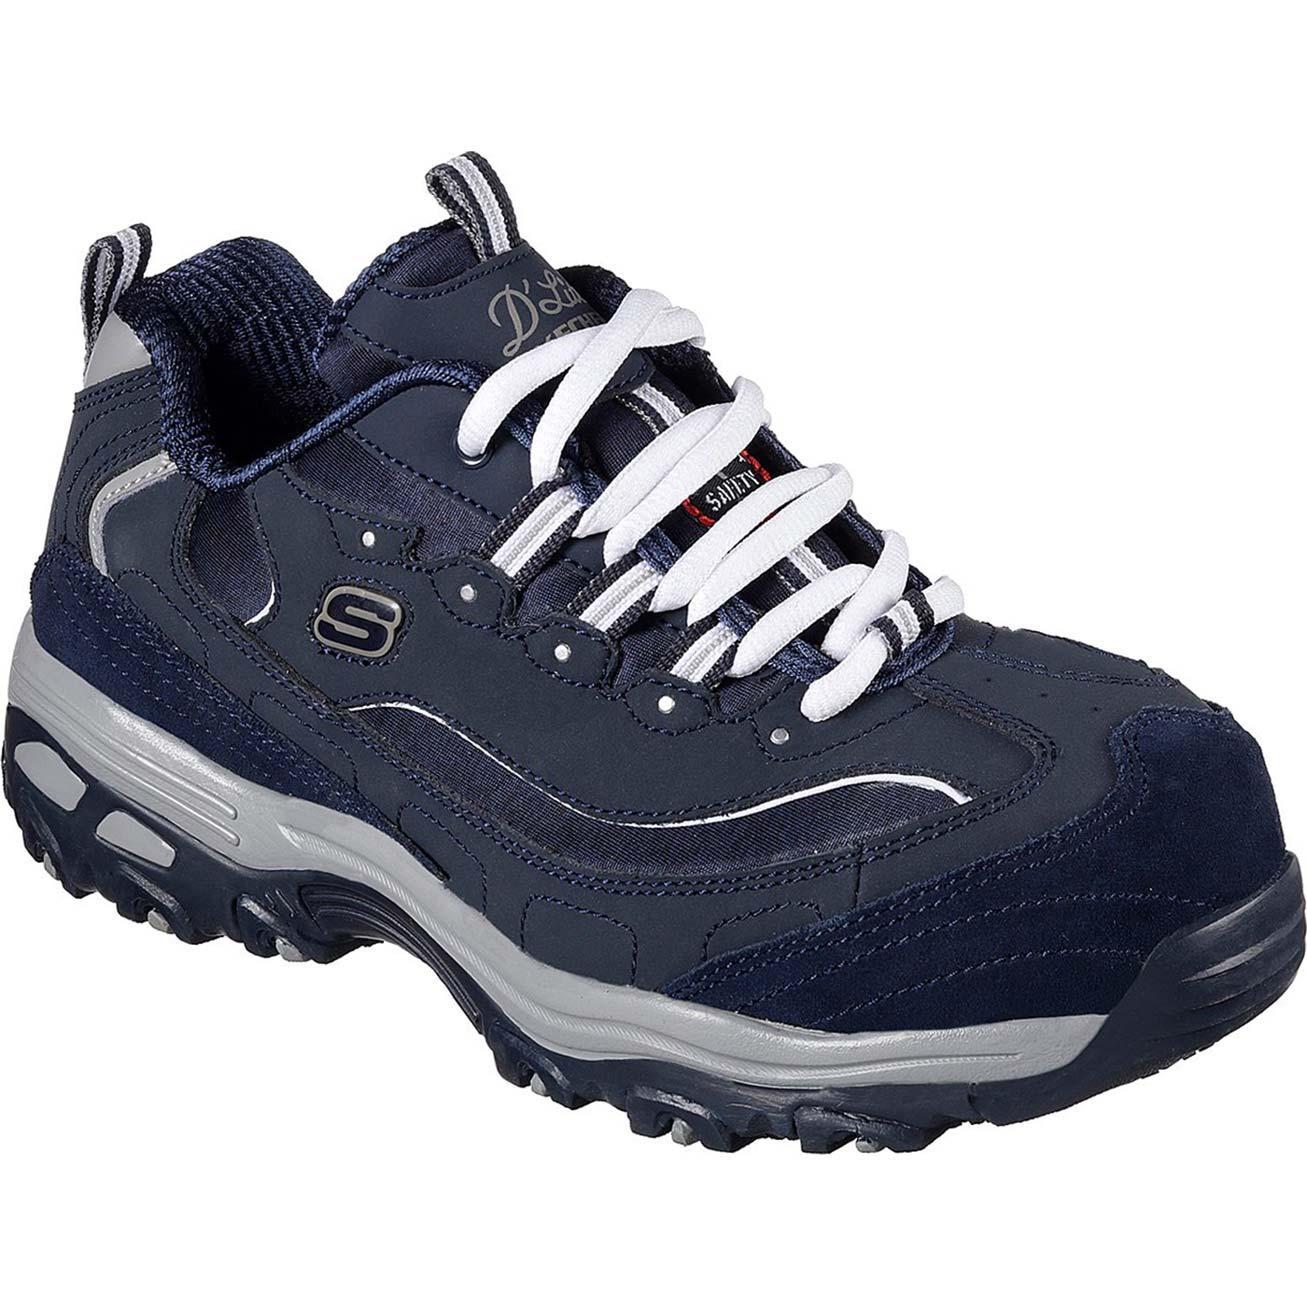 Sketchers Work Slip Resistant Shoes